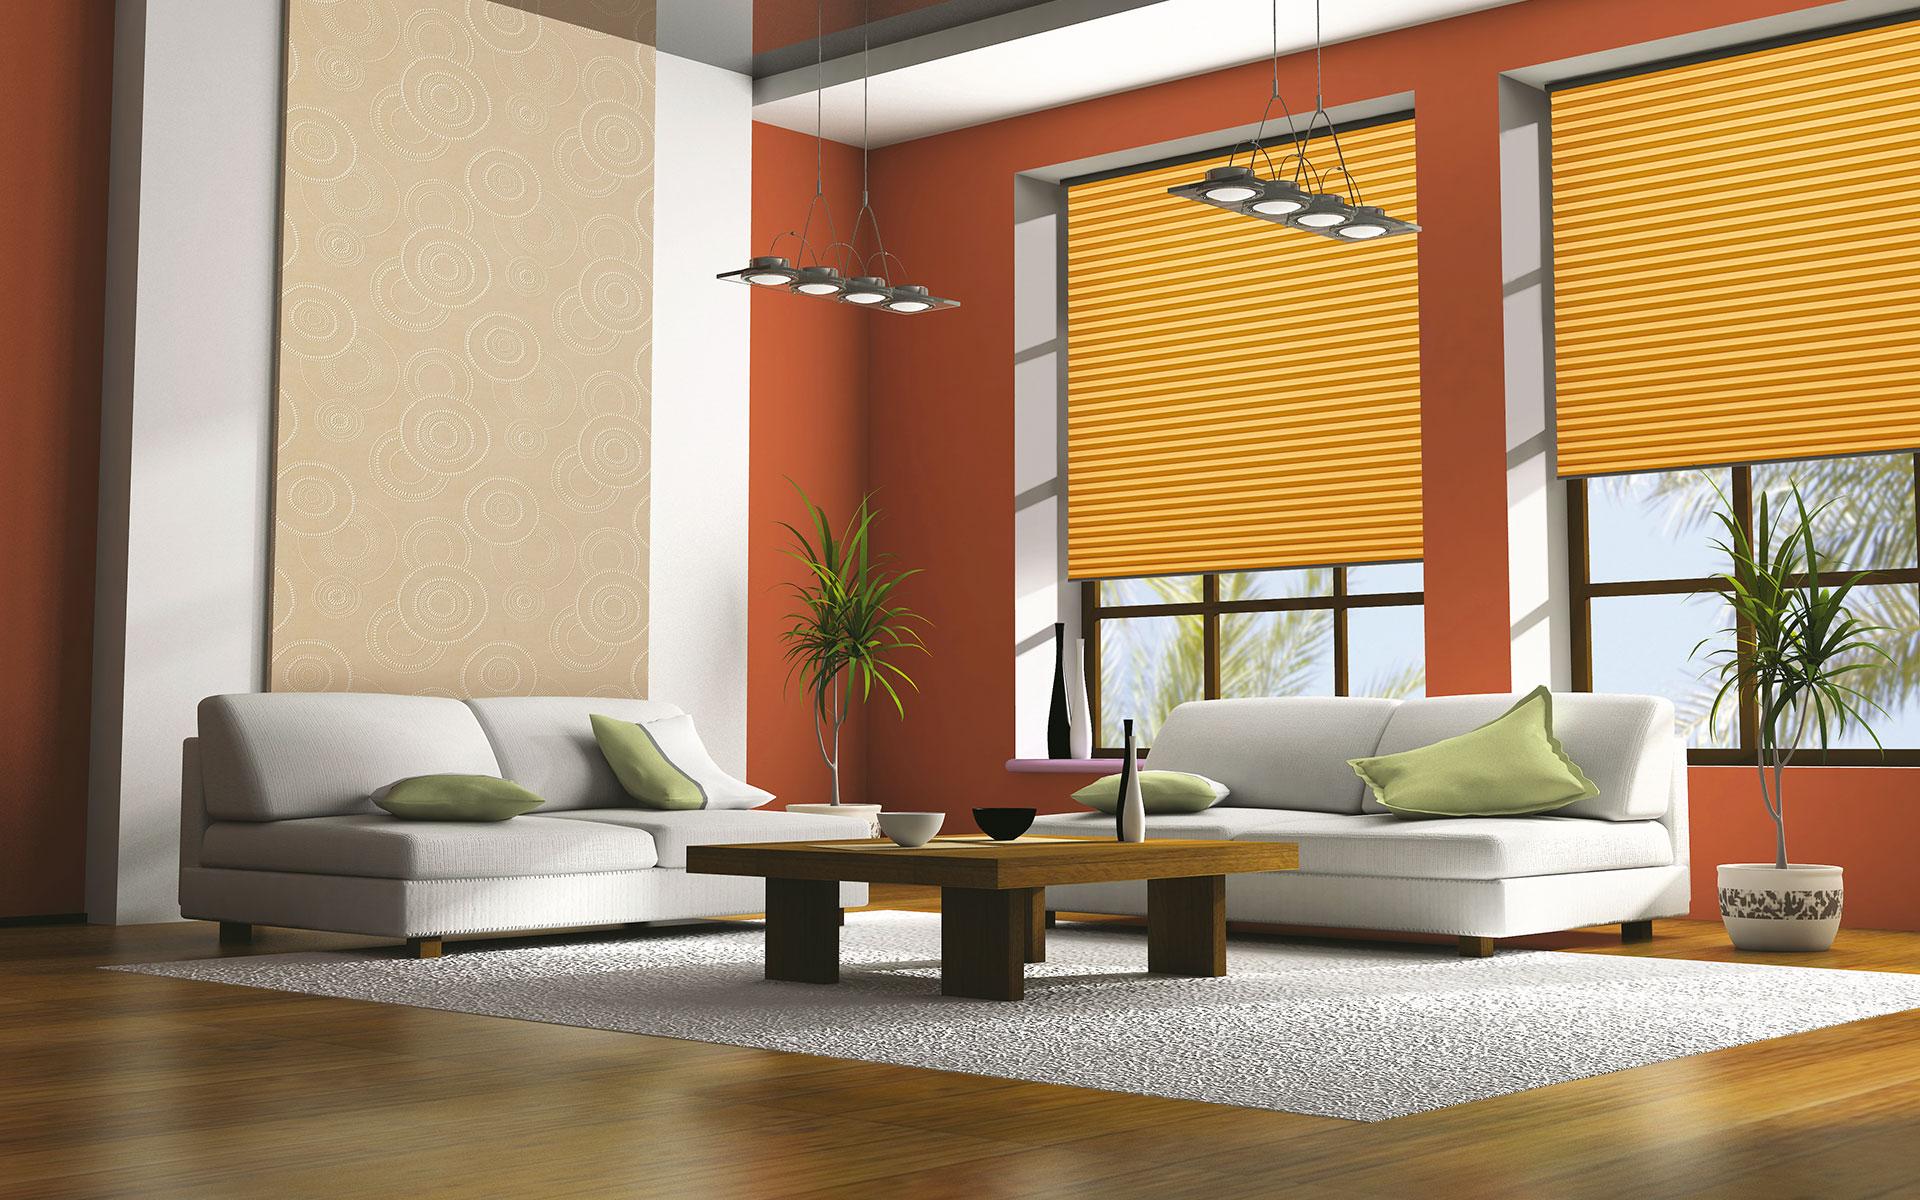 mit plissee den w rmeschutz am fenster optimieren. Black Bedroom Furniture Sets. Home Design Ideas